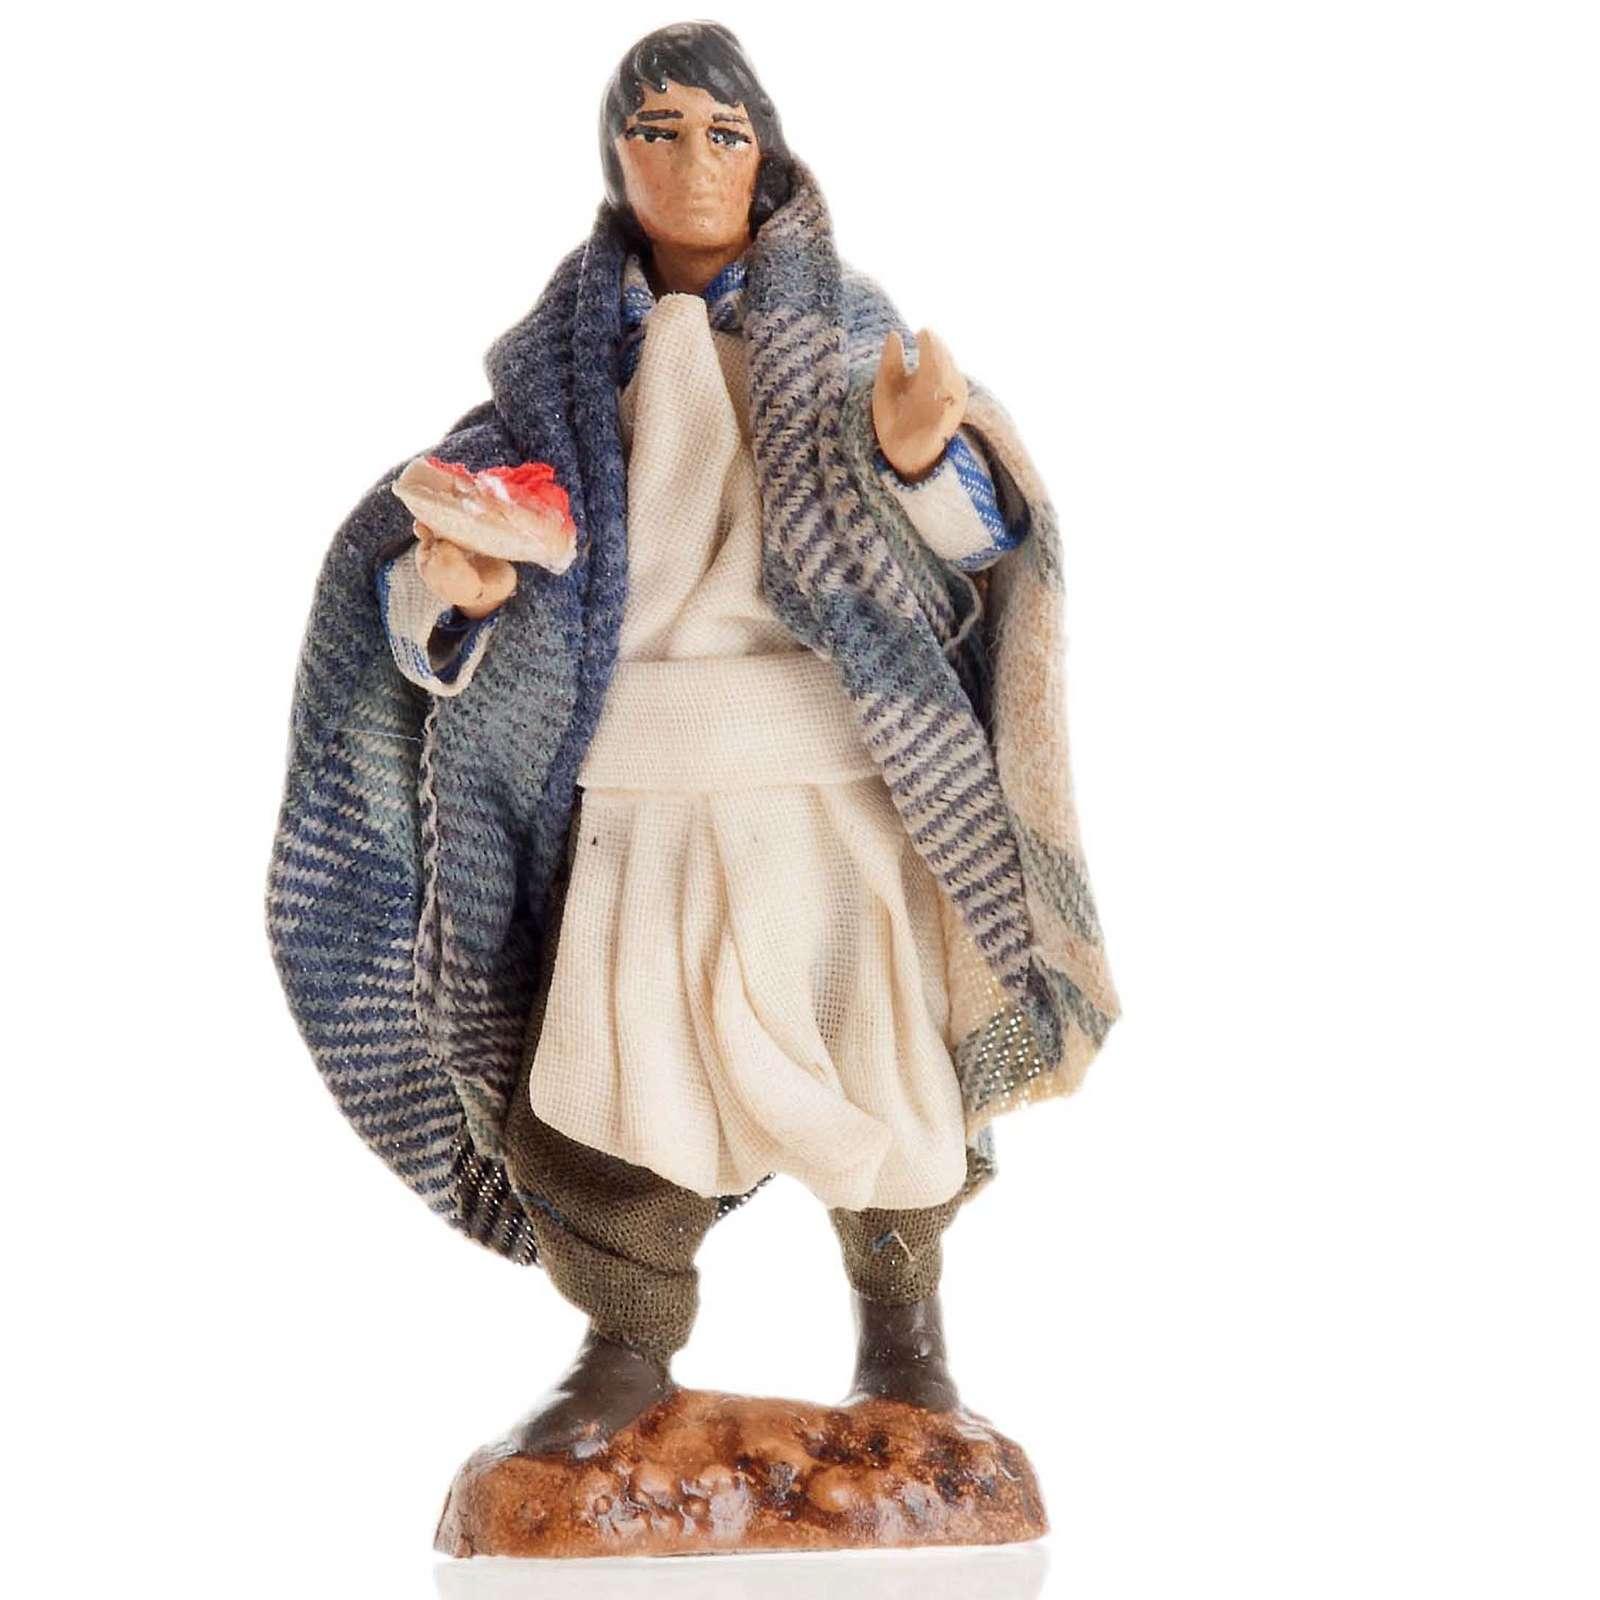 Neapolitan Nativity figurine, Waiter 8cm 4